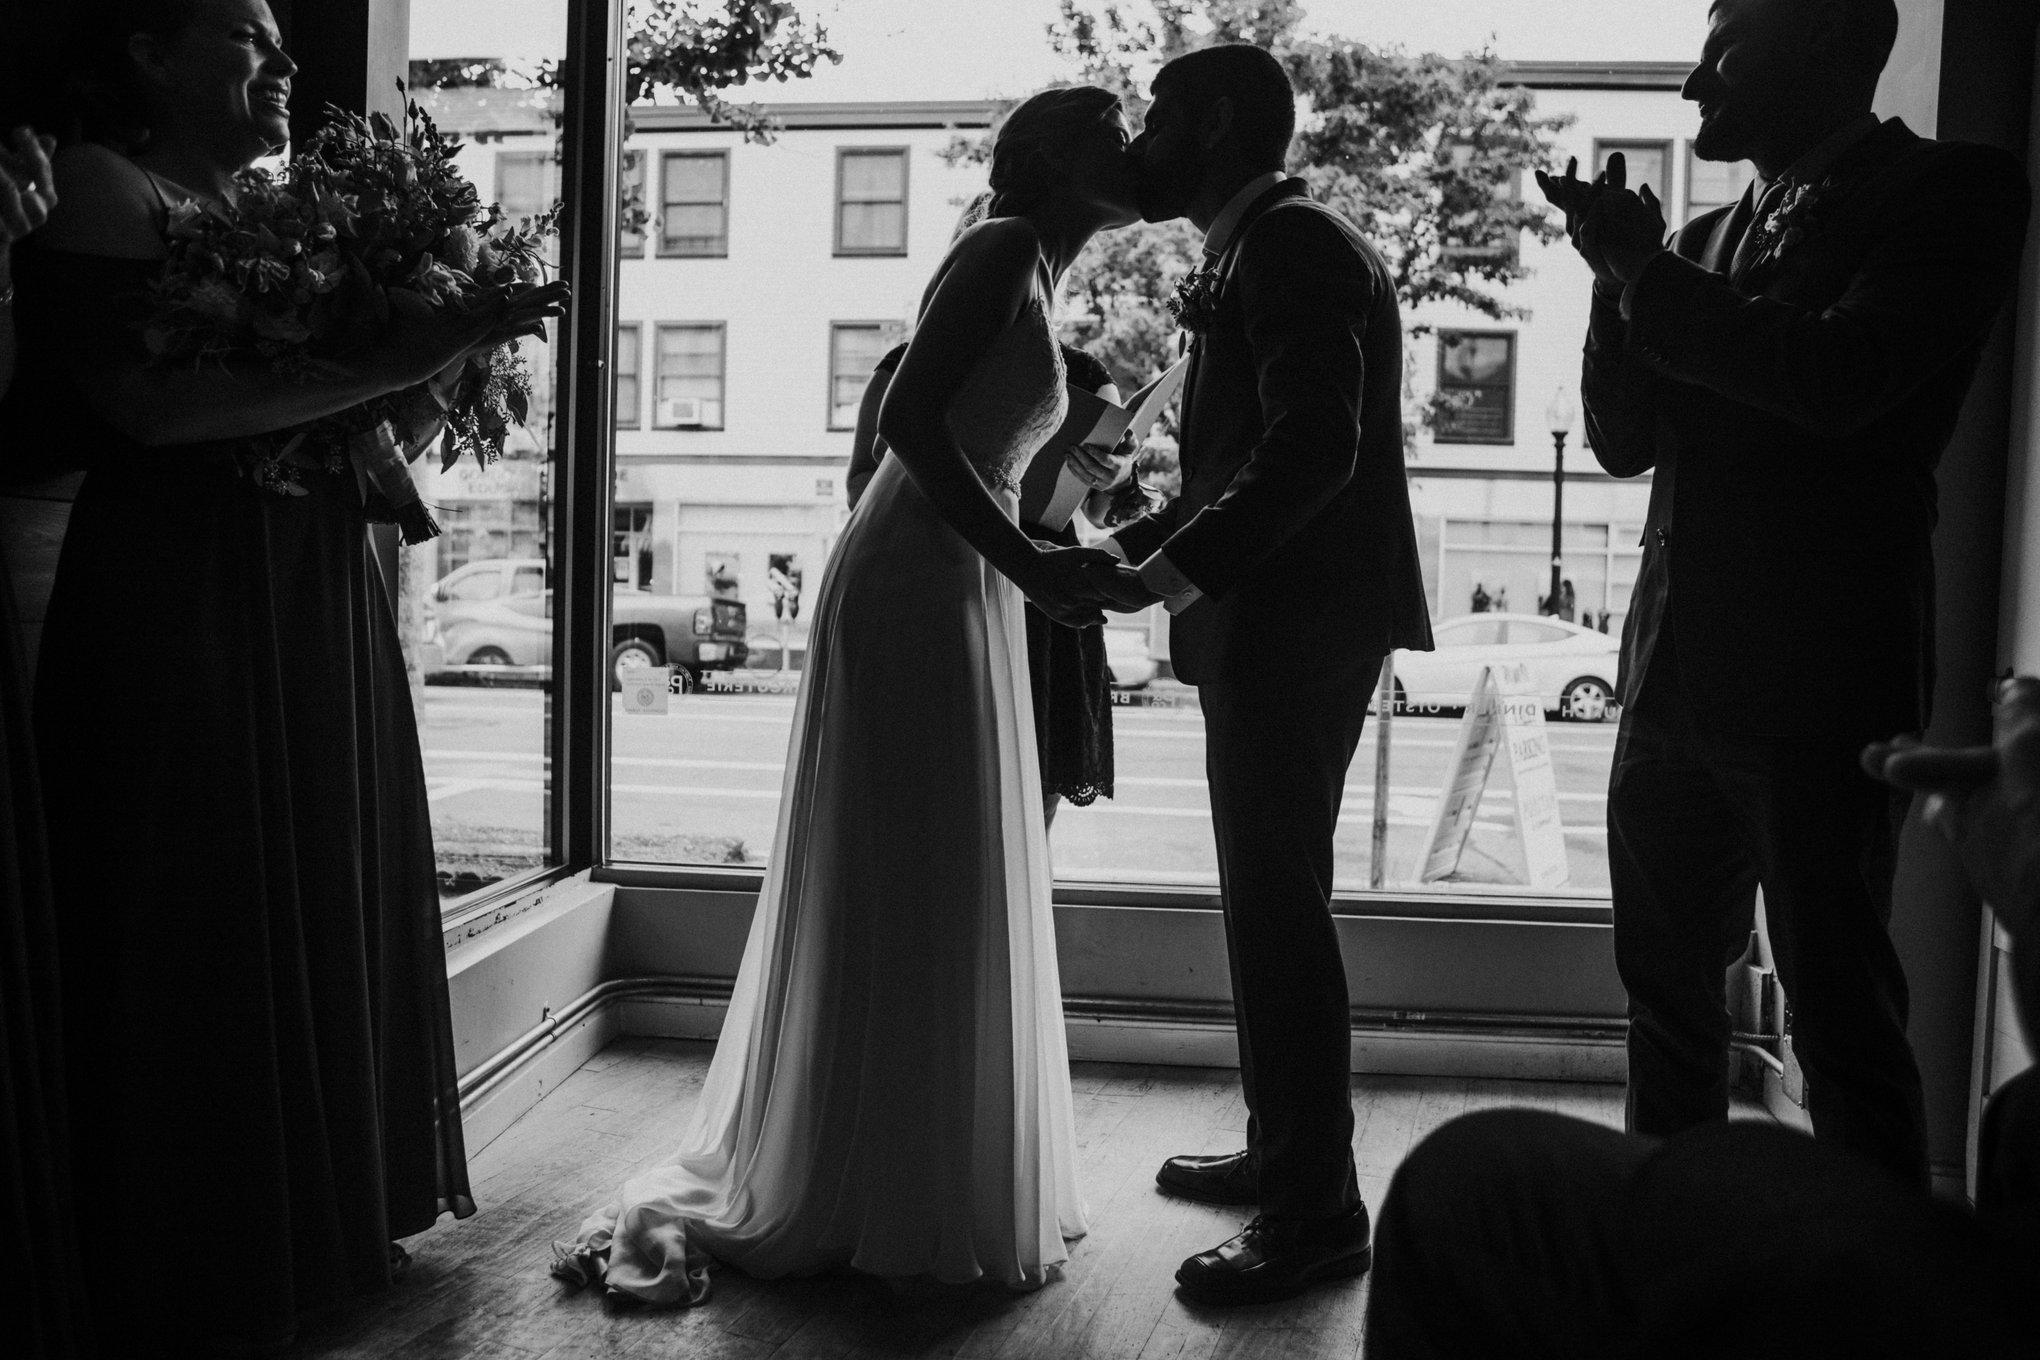 Lena_Mirisola_2017_Weddings_-016.jpg